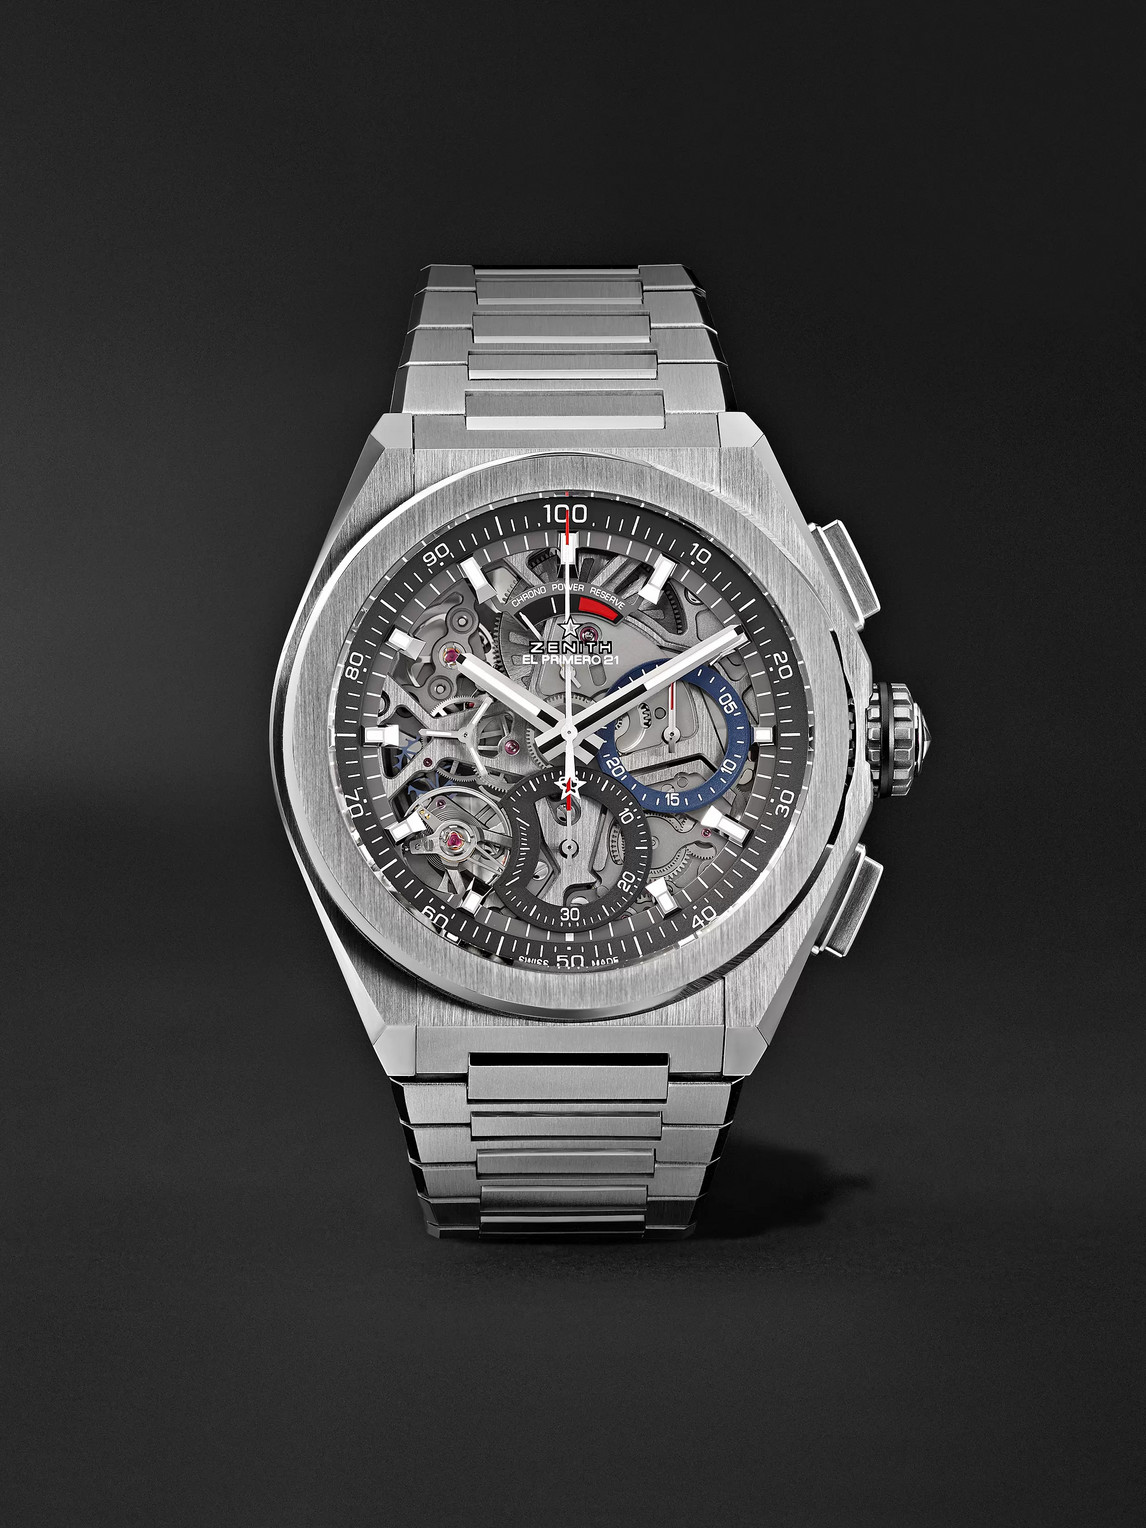 Zenith Defy El Primero 21 Chronograph 44mm Brushed-titanium Watch, Ref. No. 95.9000.9004/78.m9000 In Silver